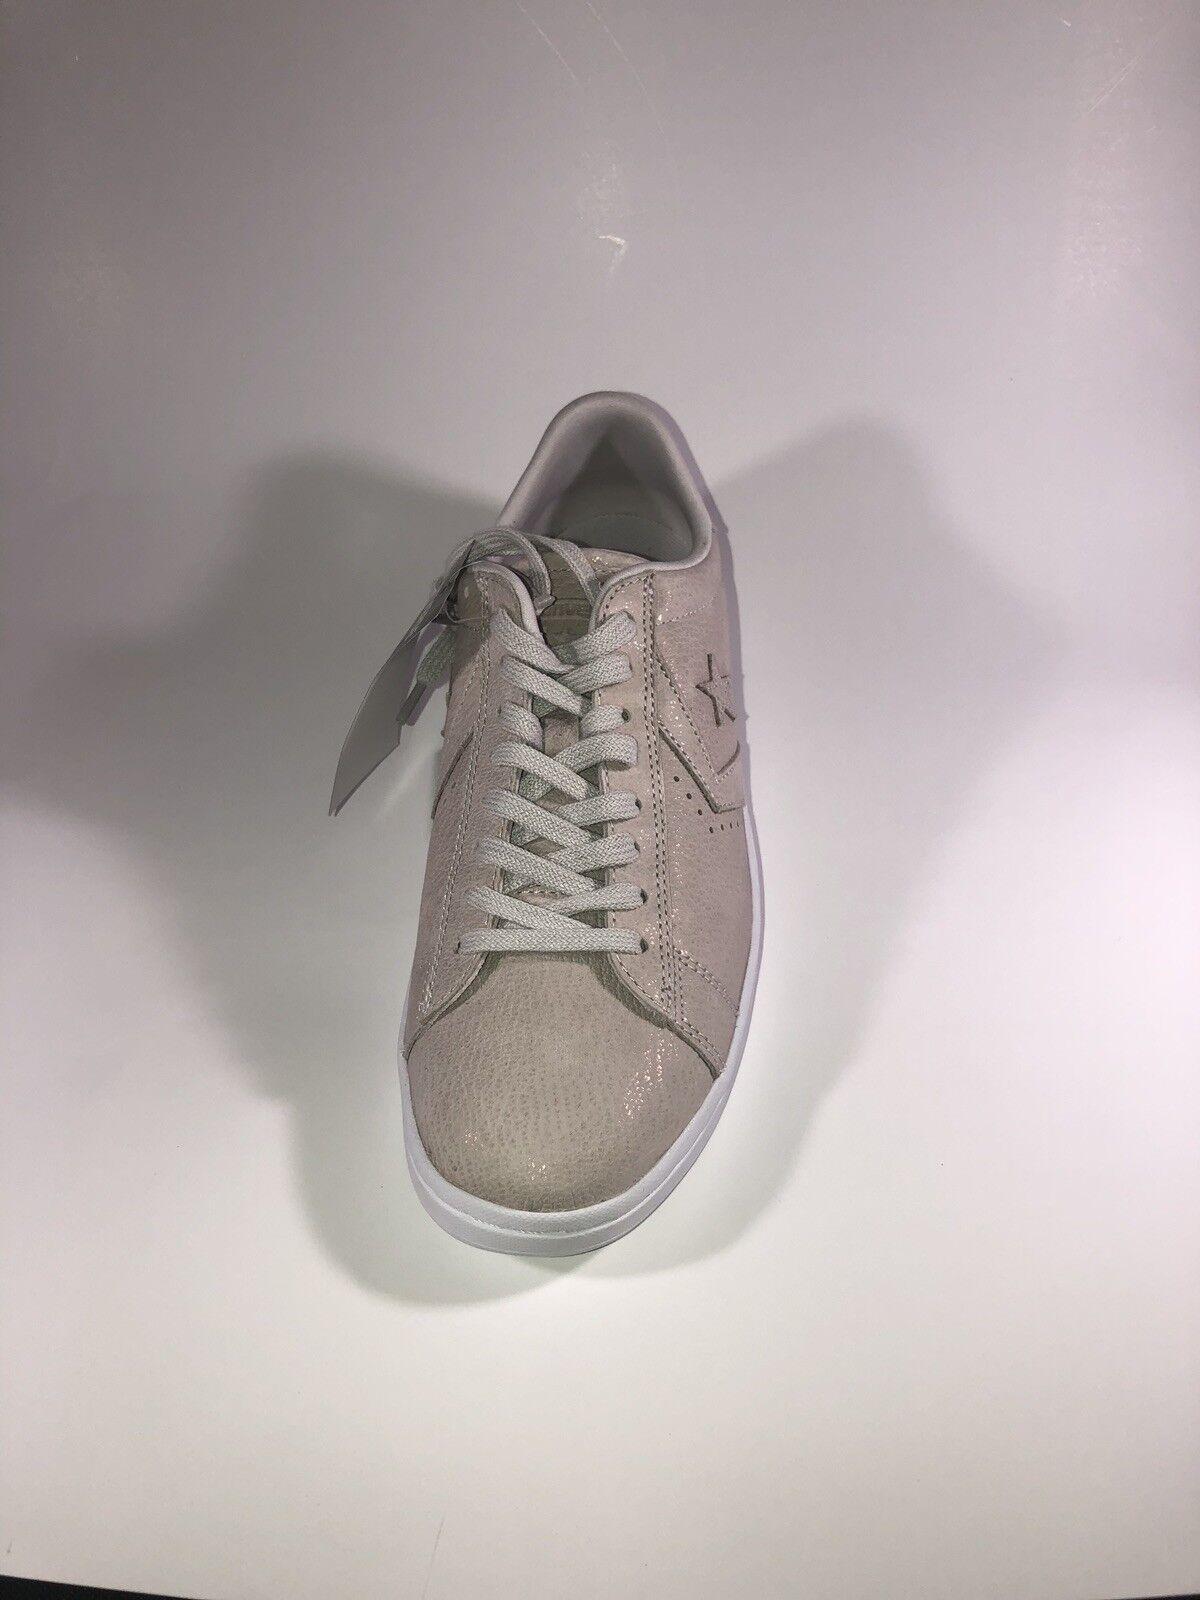 Converse Pro Leather LP OX Pale Putty White 559852C 559852C 559852C US Women Size 8.5 52ab45